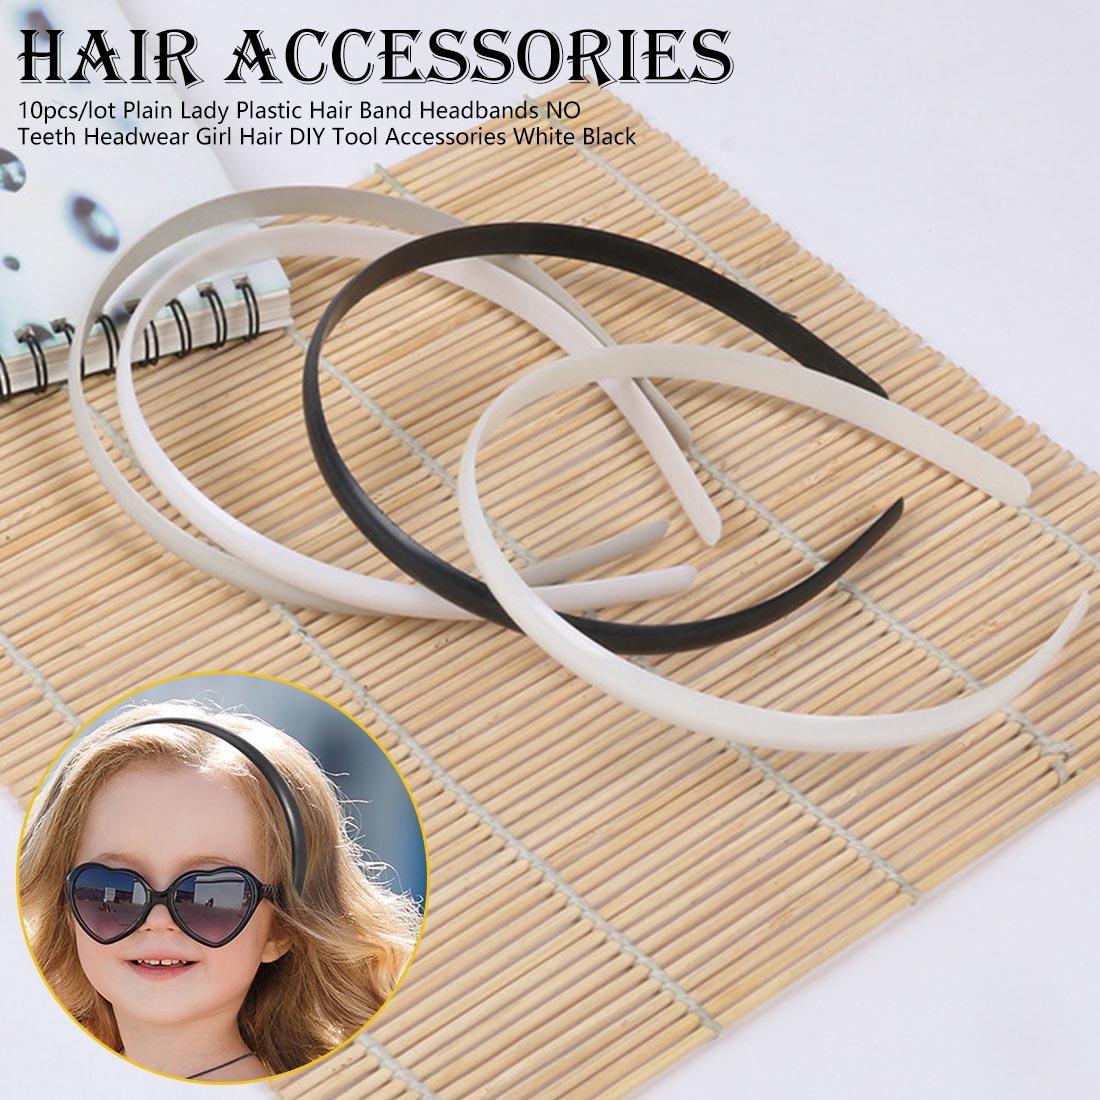 10pcs/lot Plain  DIY Tool Accessories White Black Lady Plastic Hair Band Headbands NO Teeth Headwear Girl Hair